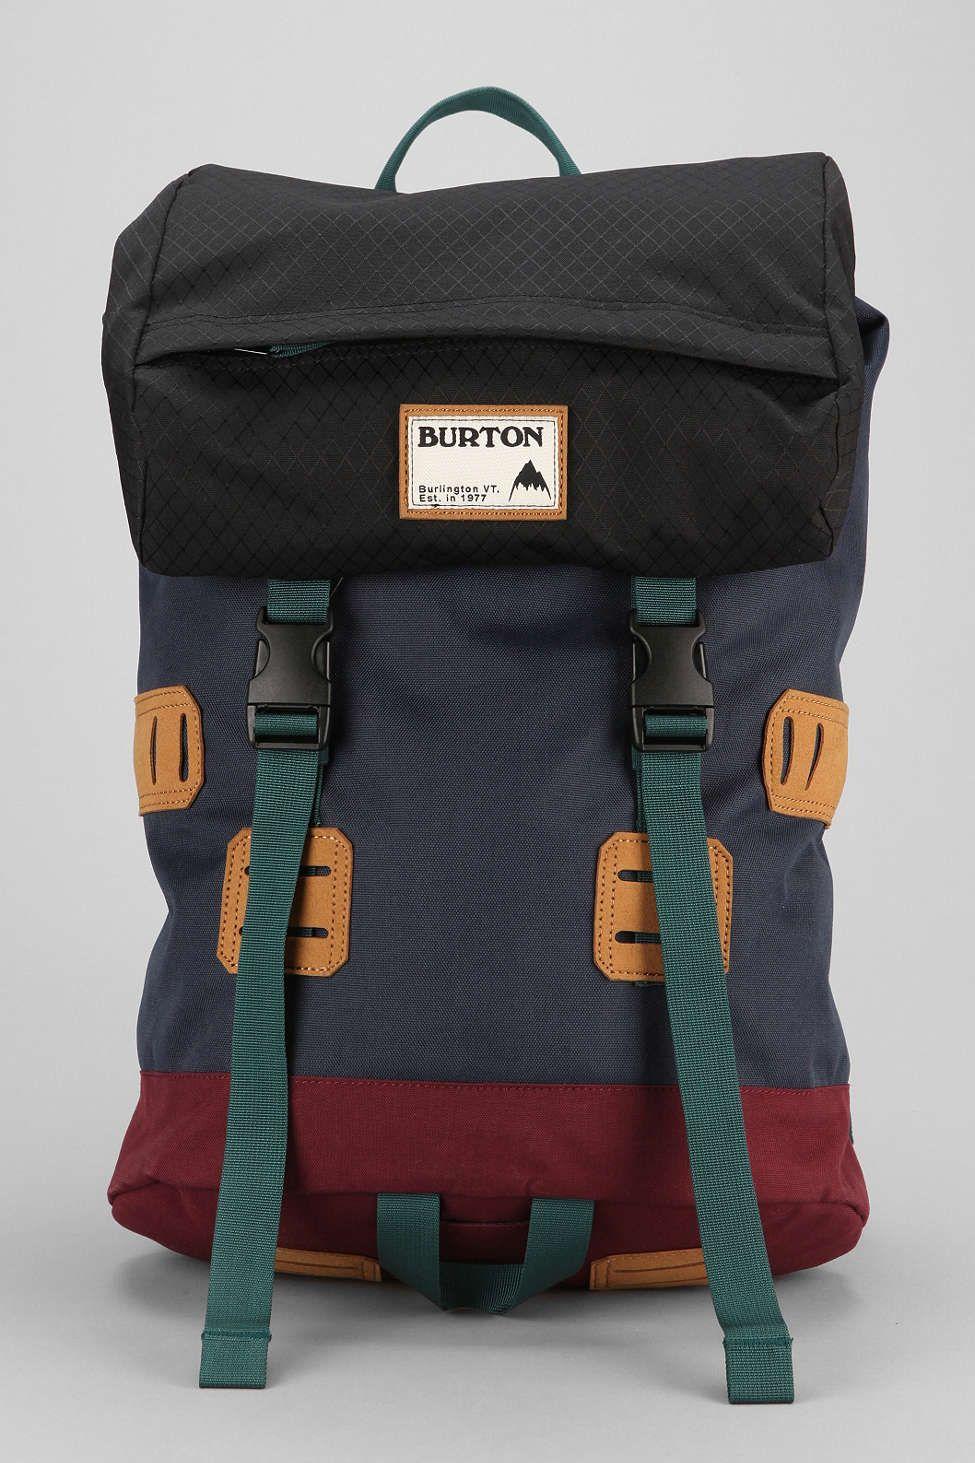 best 25 burton backpack ideas on pinterest burton tinder burton luggage and canvas backpack. Black Bedroom Furniture Sets. Home Design Ideas